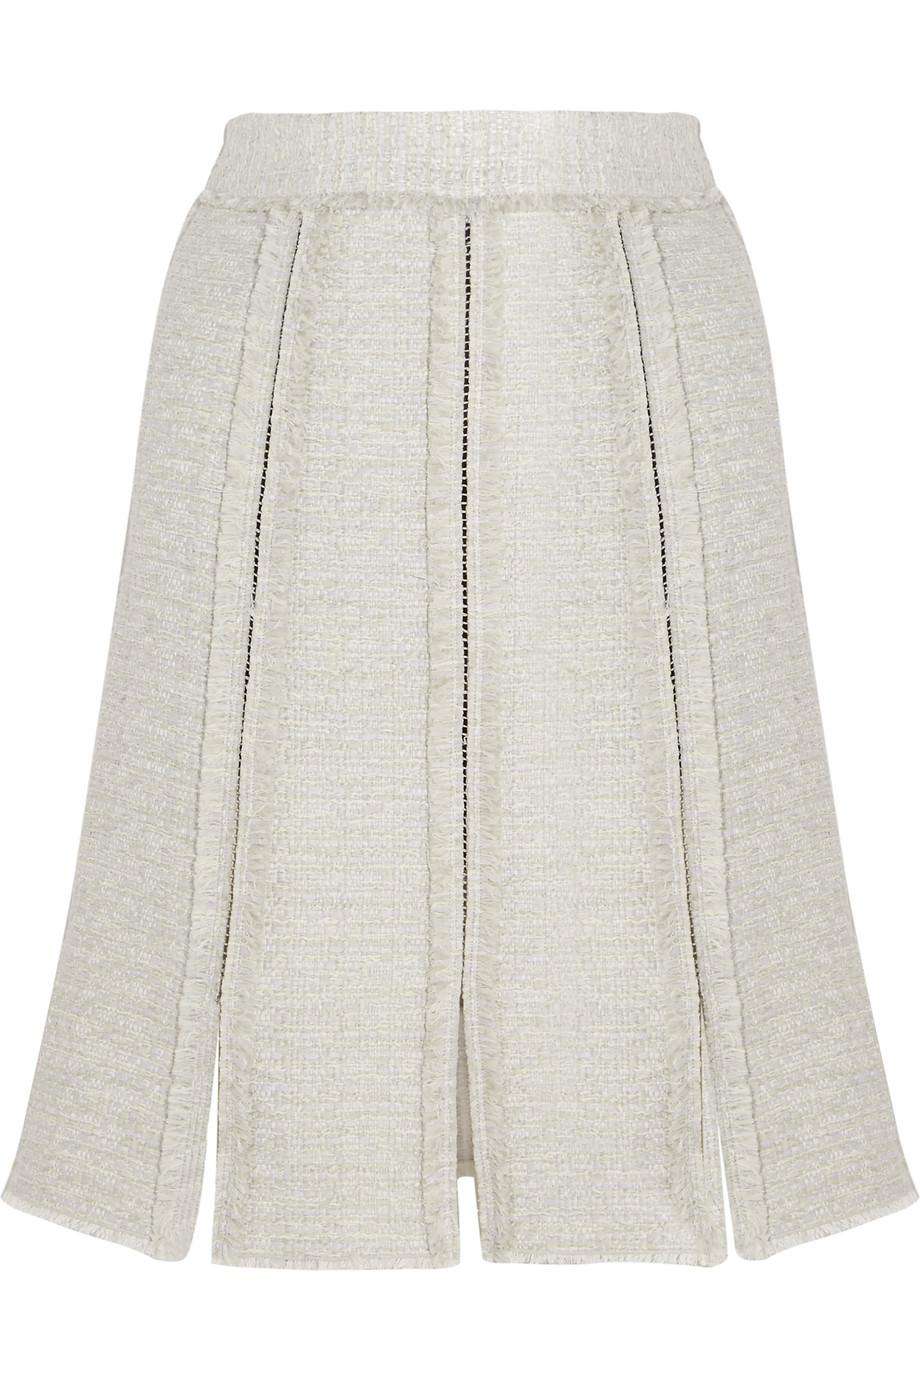 Proenza Schouler Paneled Frayed Tweed Skirt, Light Gray, Women's, Size: 6